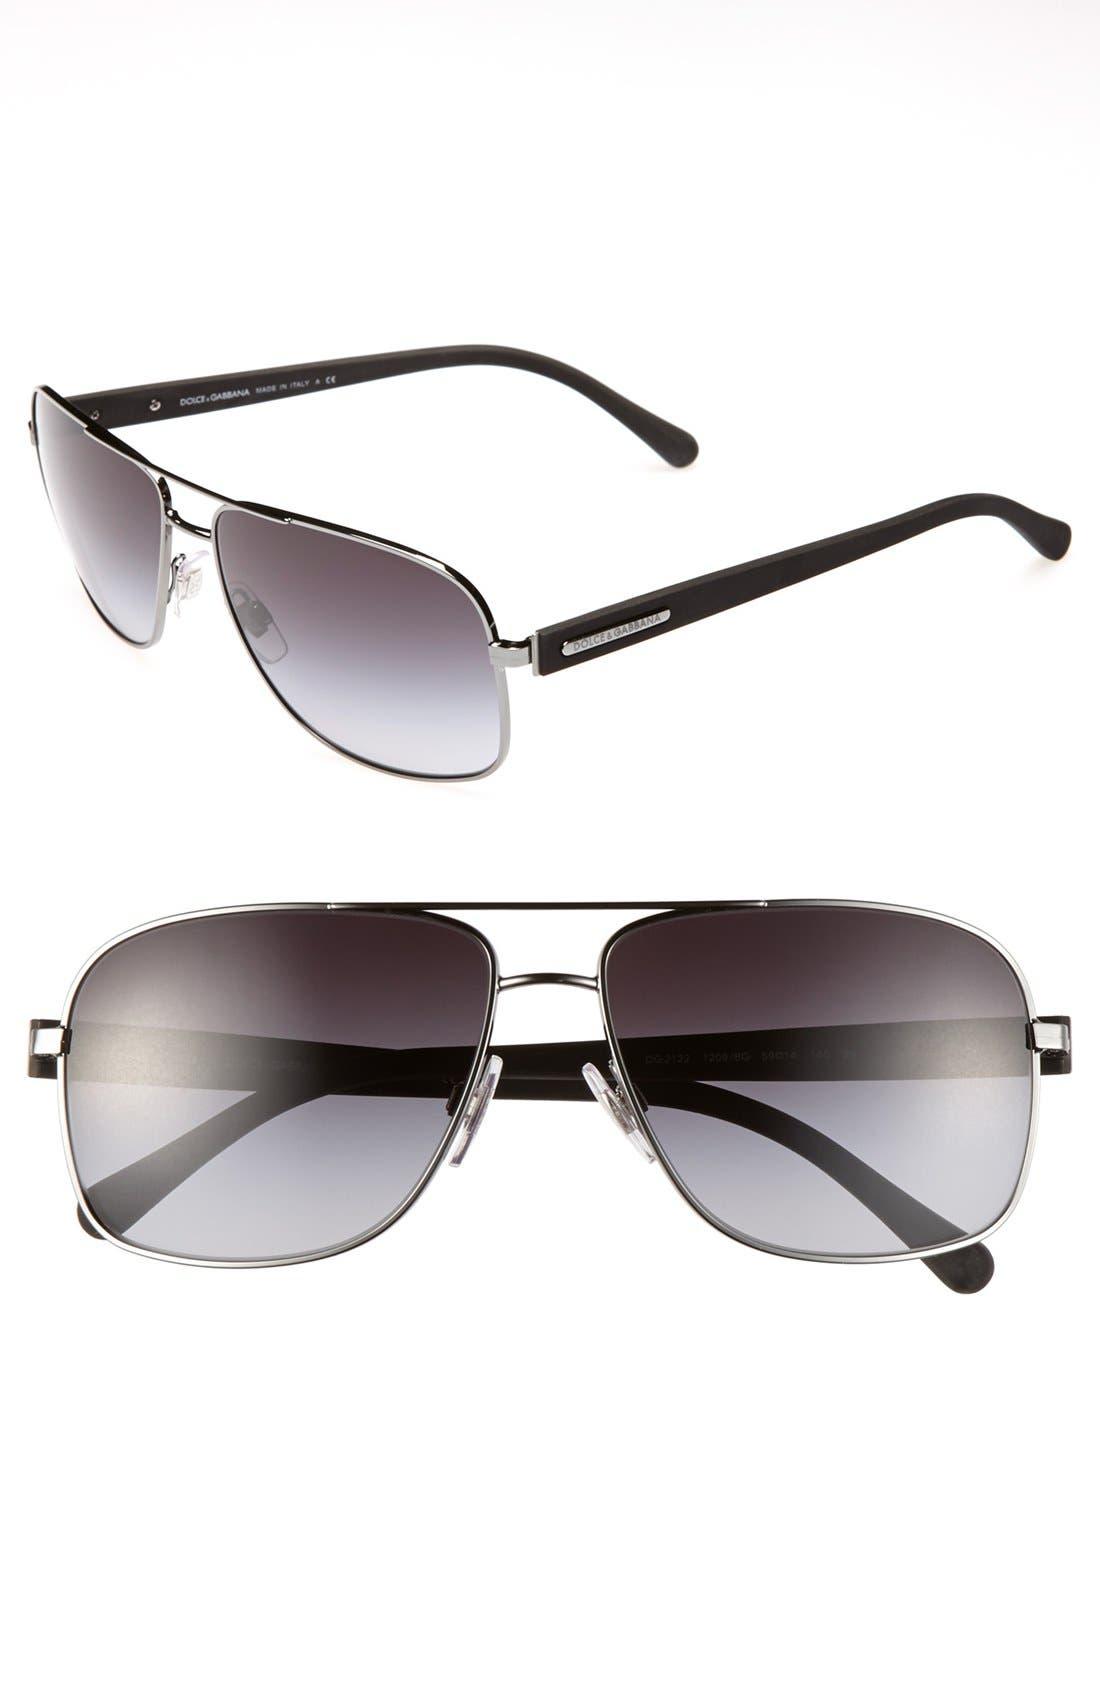 Alternate Image 1 Selected - Dolce&Gabbana 59mm Square Sunglasses